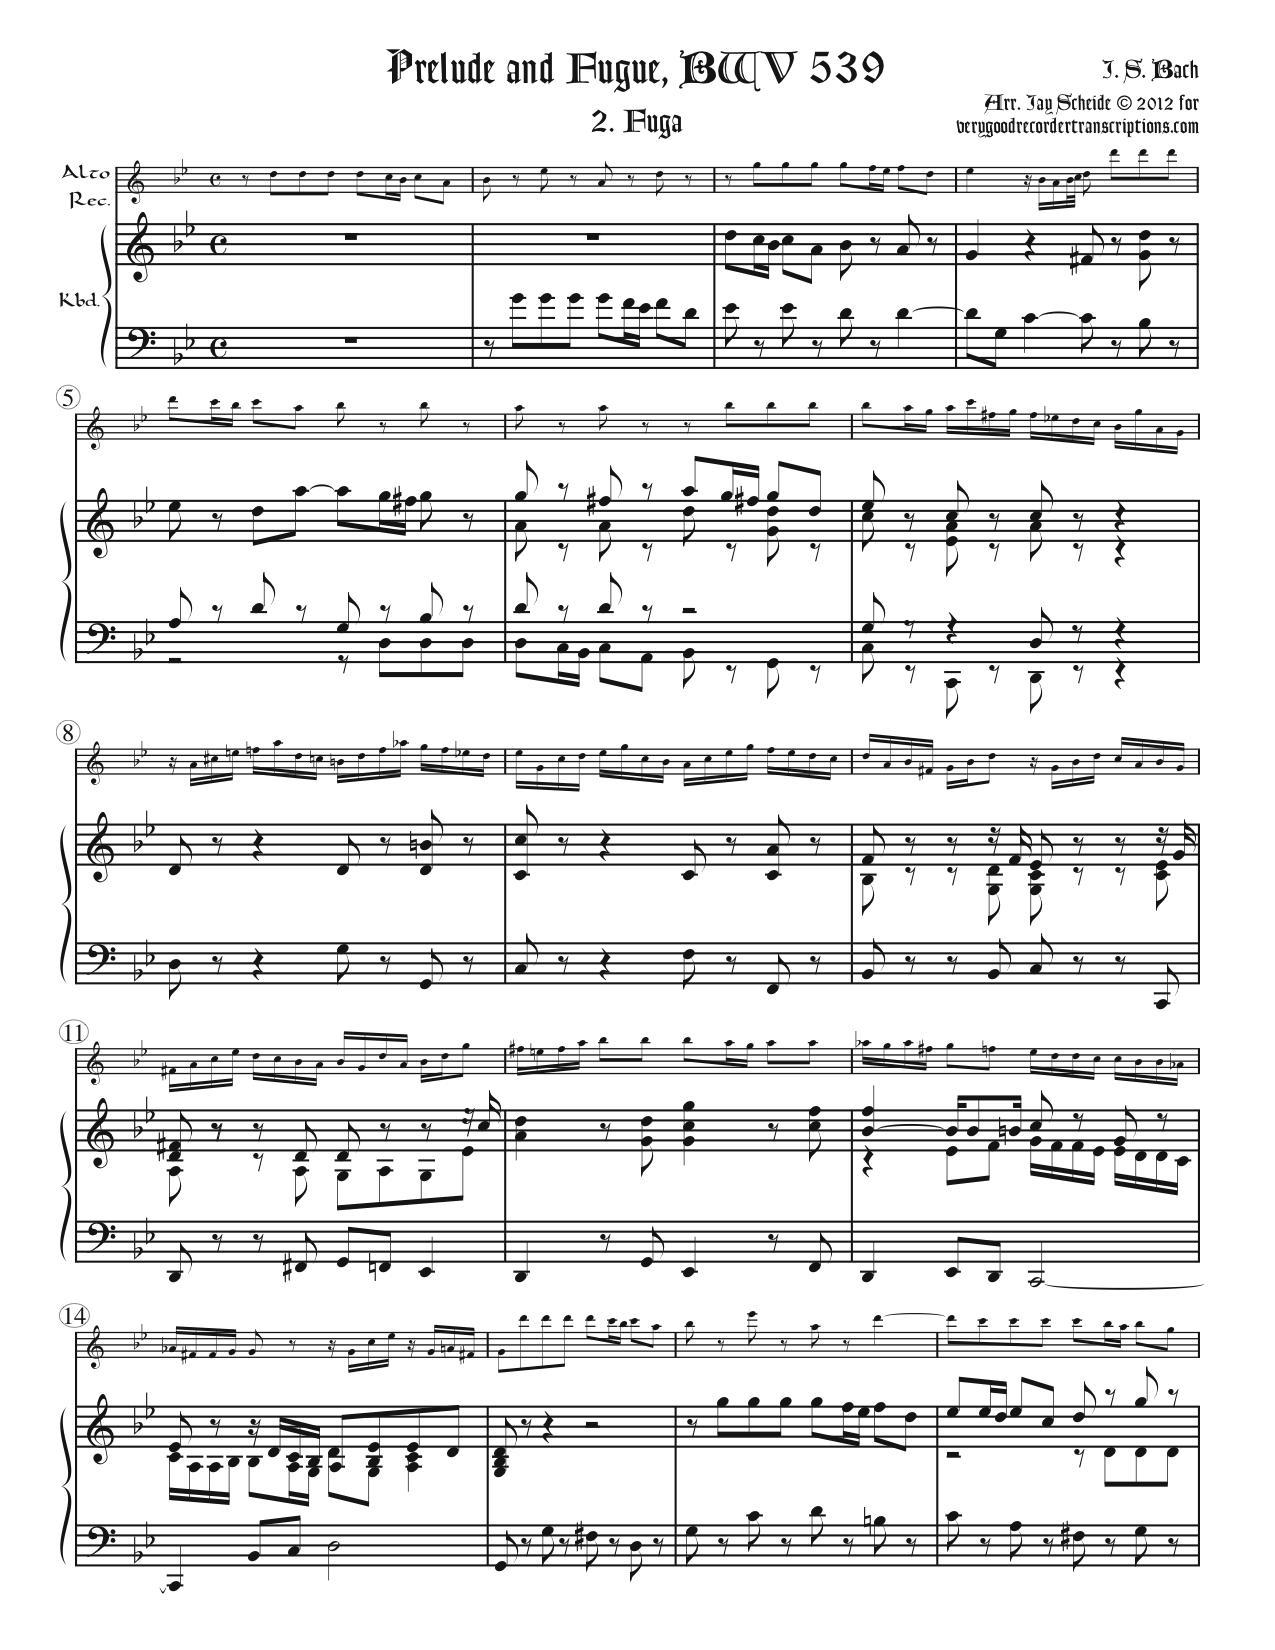 Fugue from BWV 539